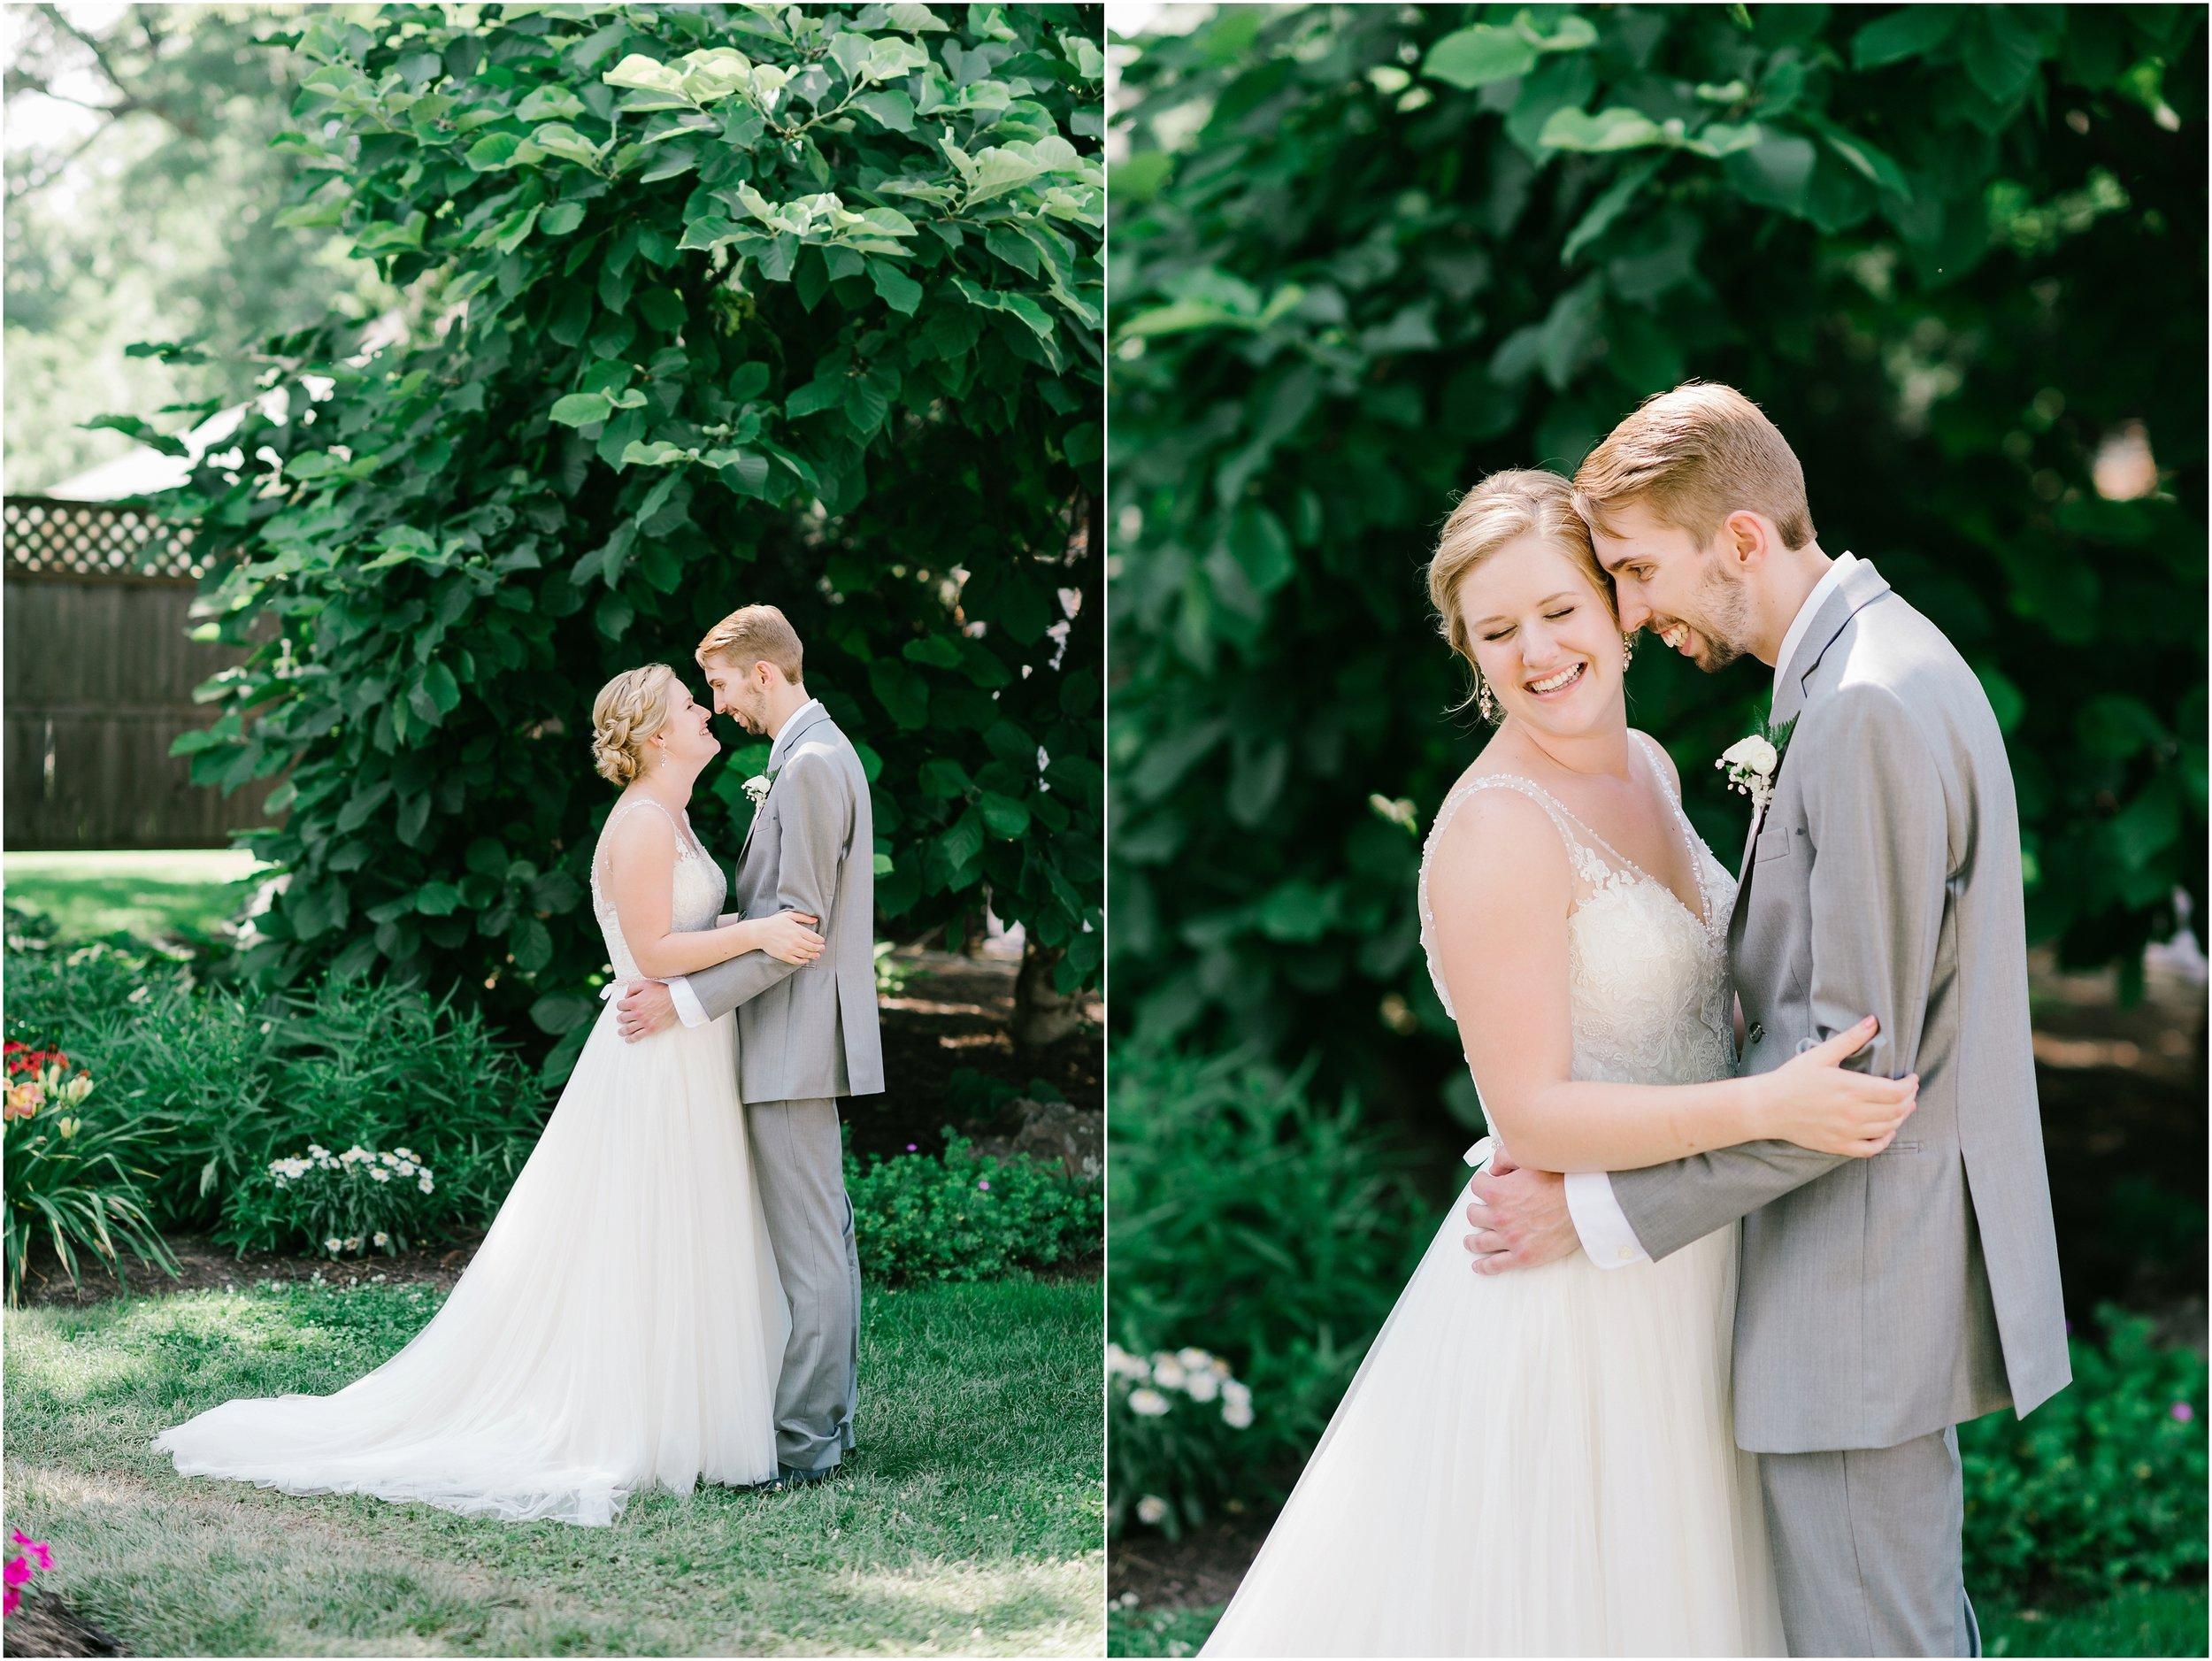 Rebecca_Shehorn_Photography_Indianapolis_Wedding_Photographer_8494.jpg